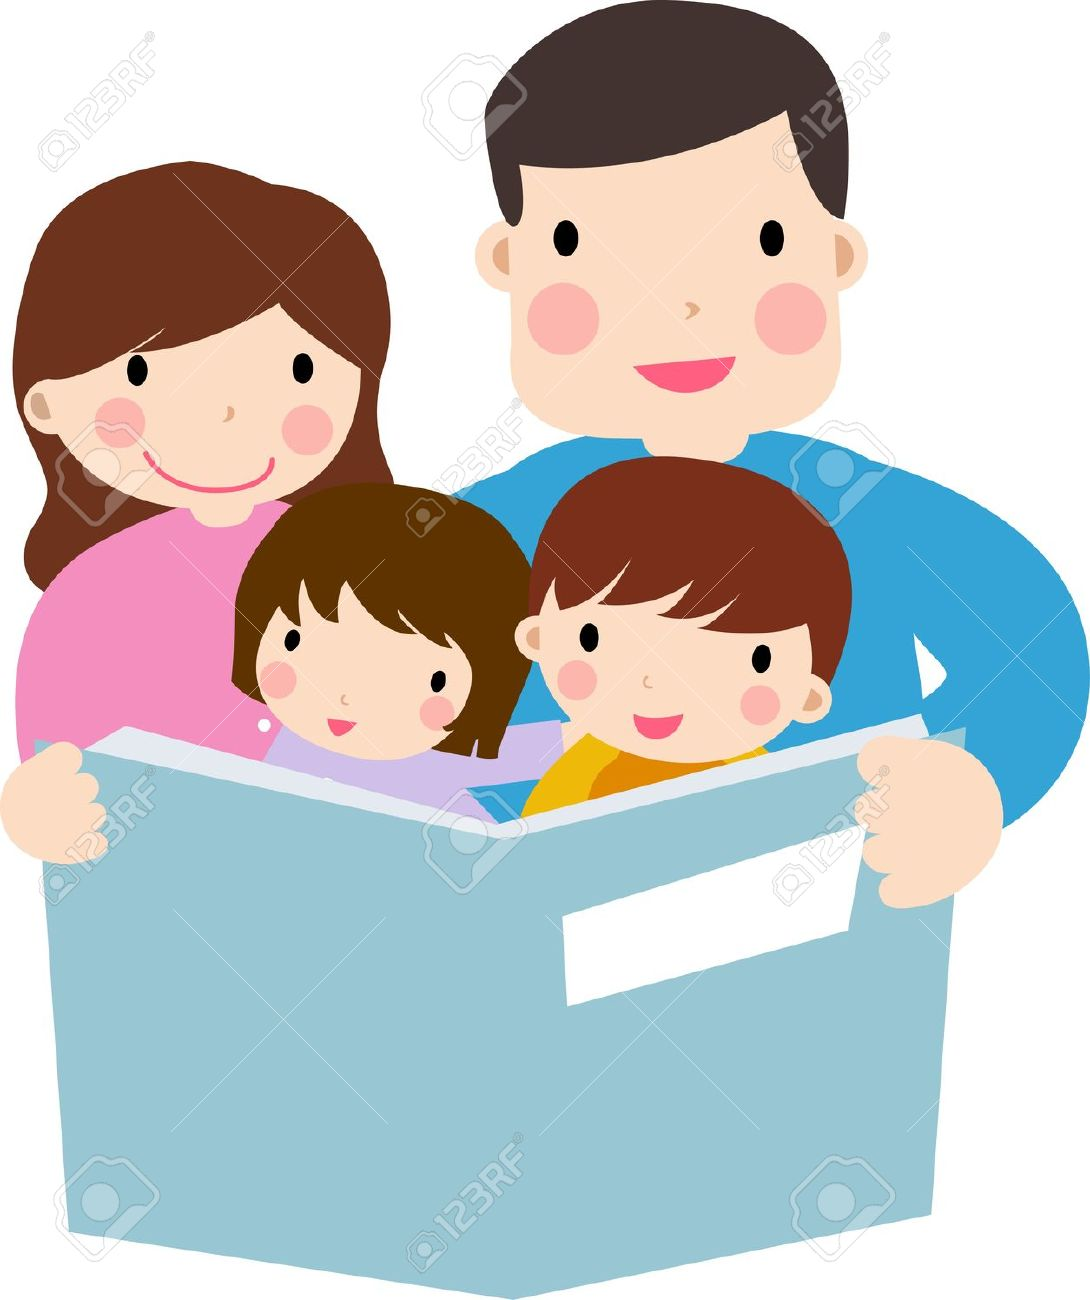 1090x1300 Parent And Child Clipart